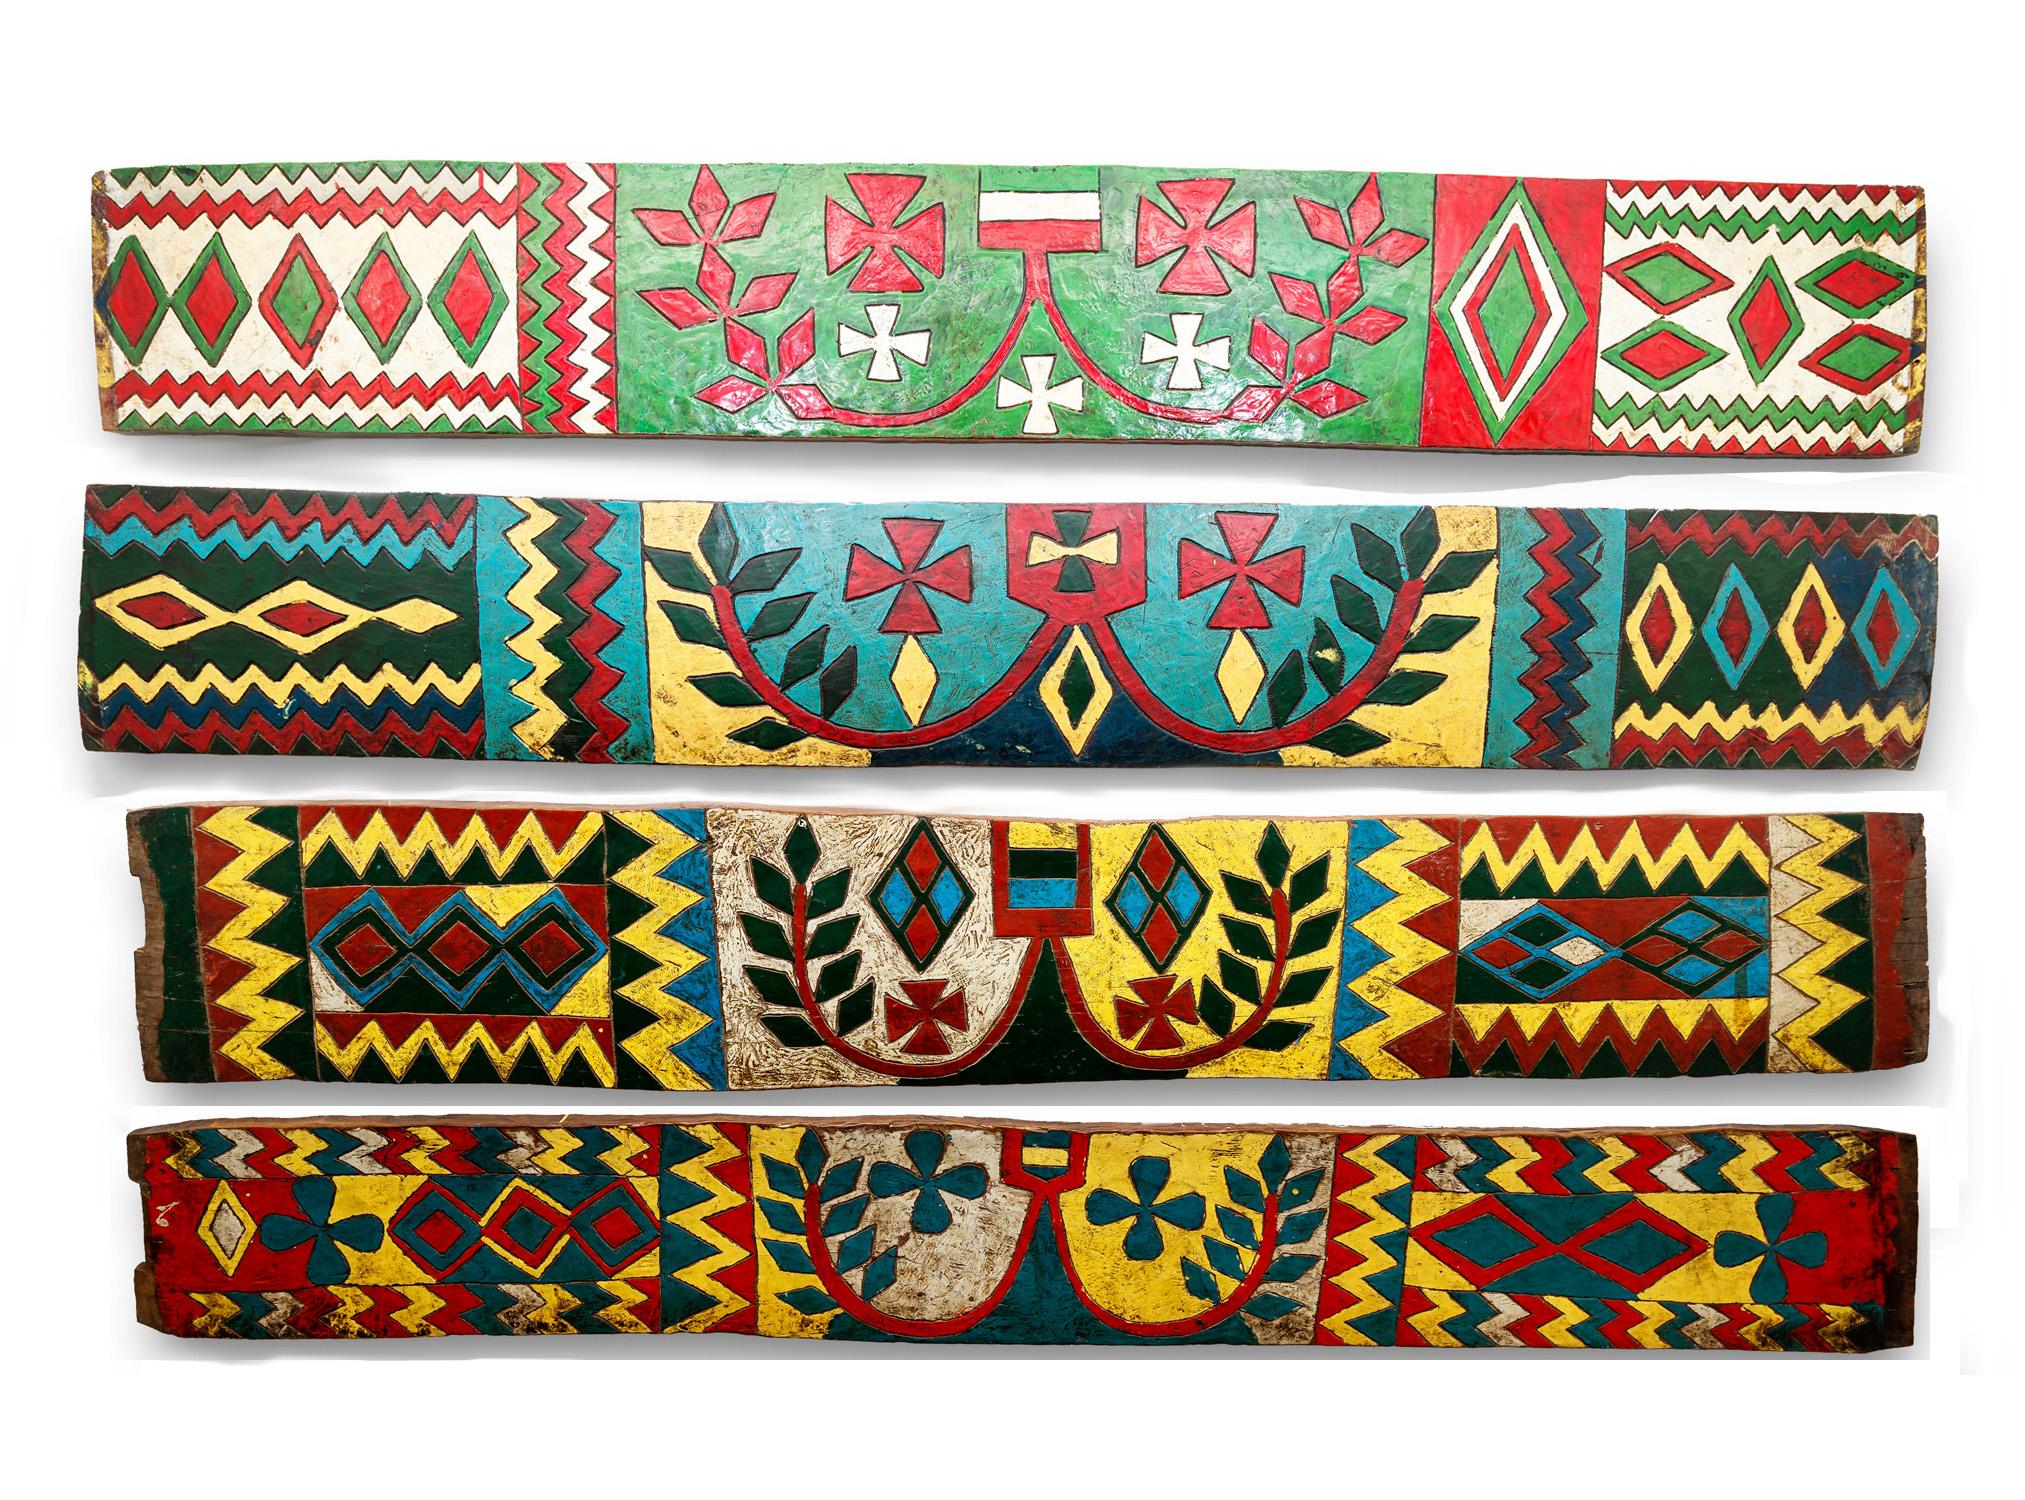 Painted Panels, Ethiopia